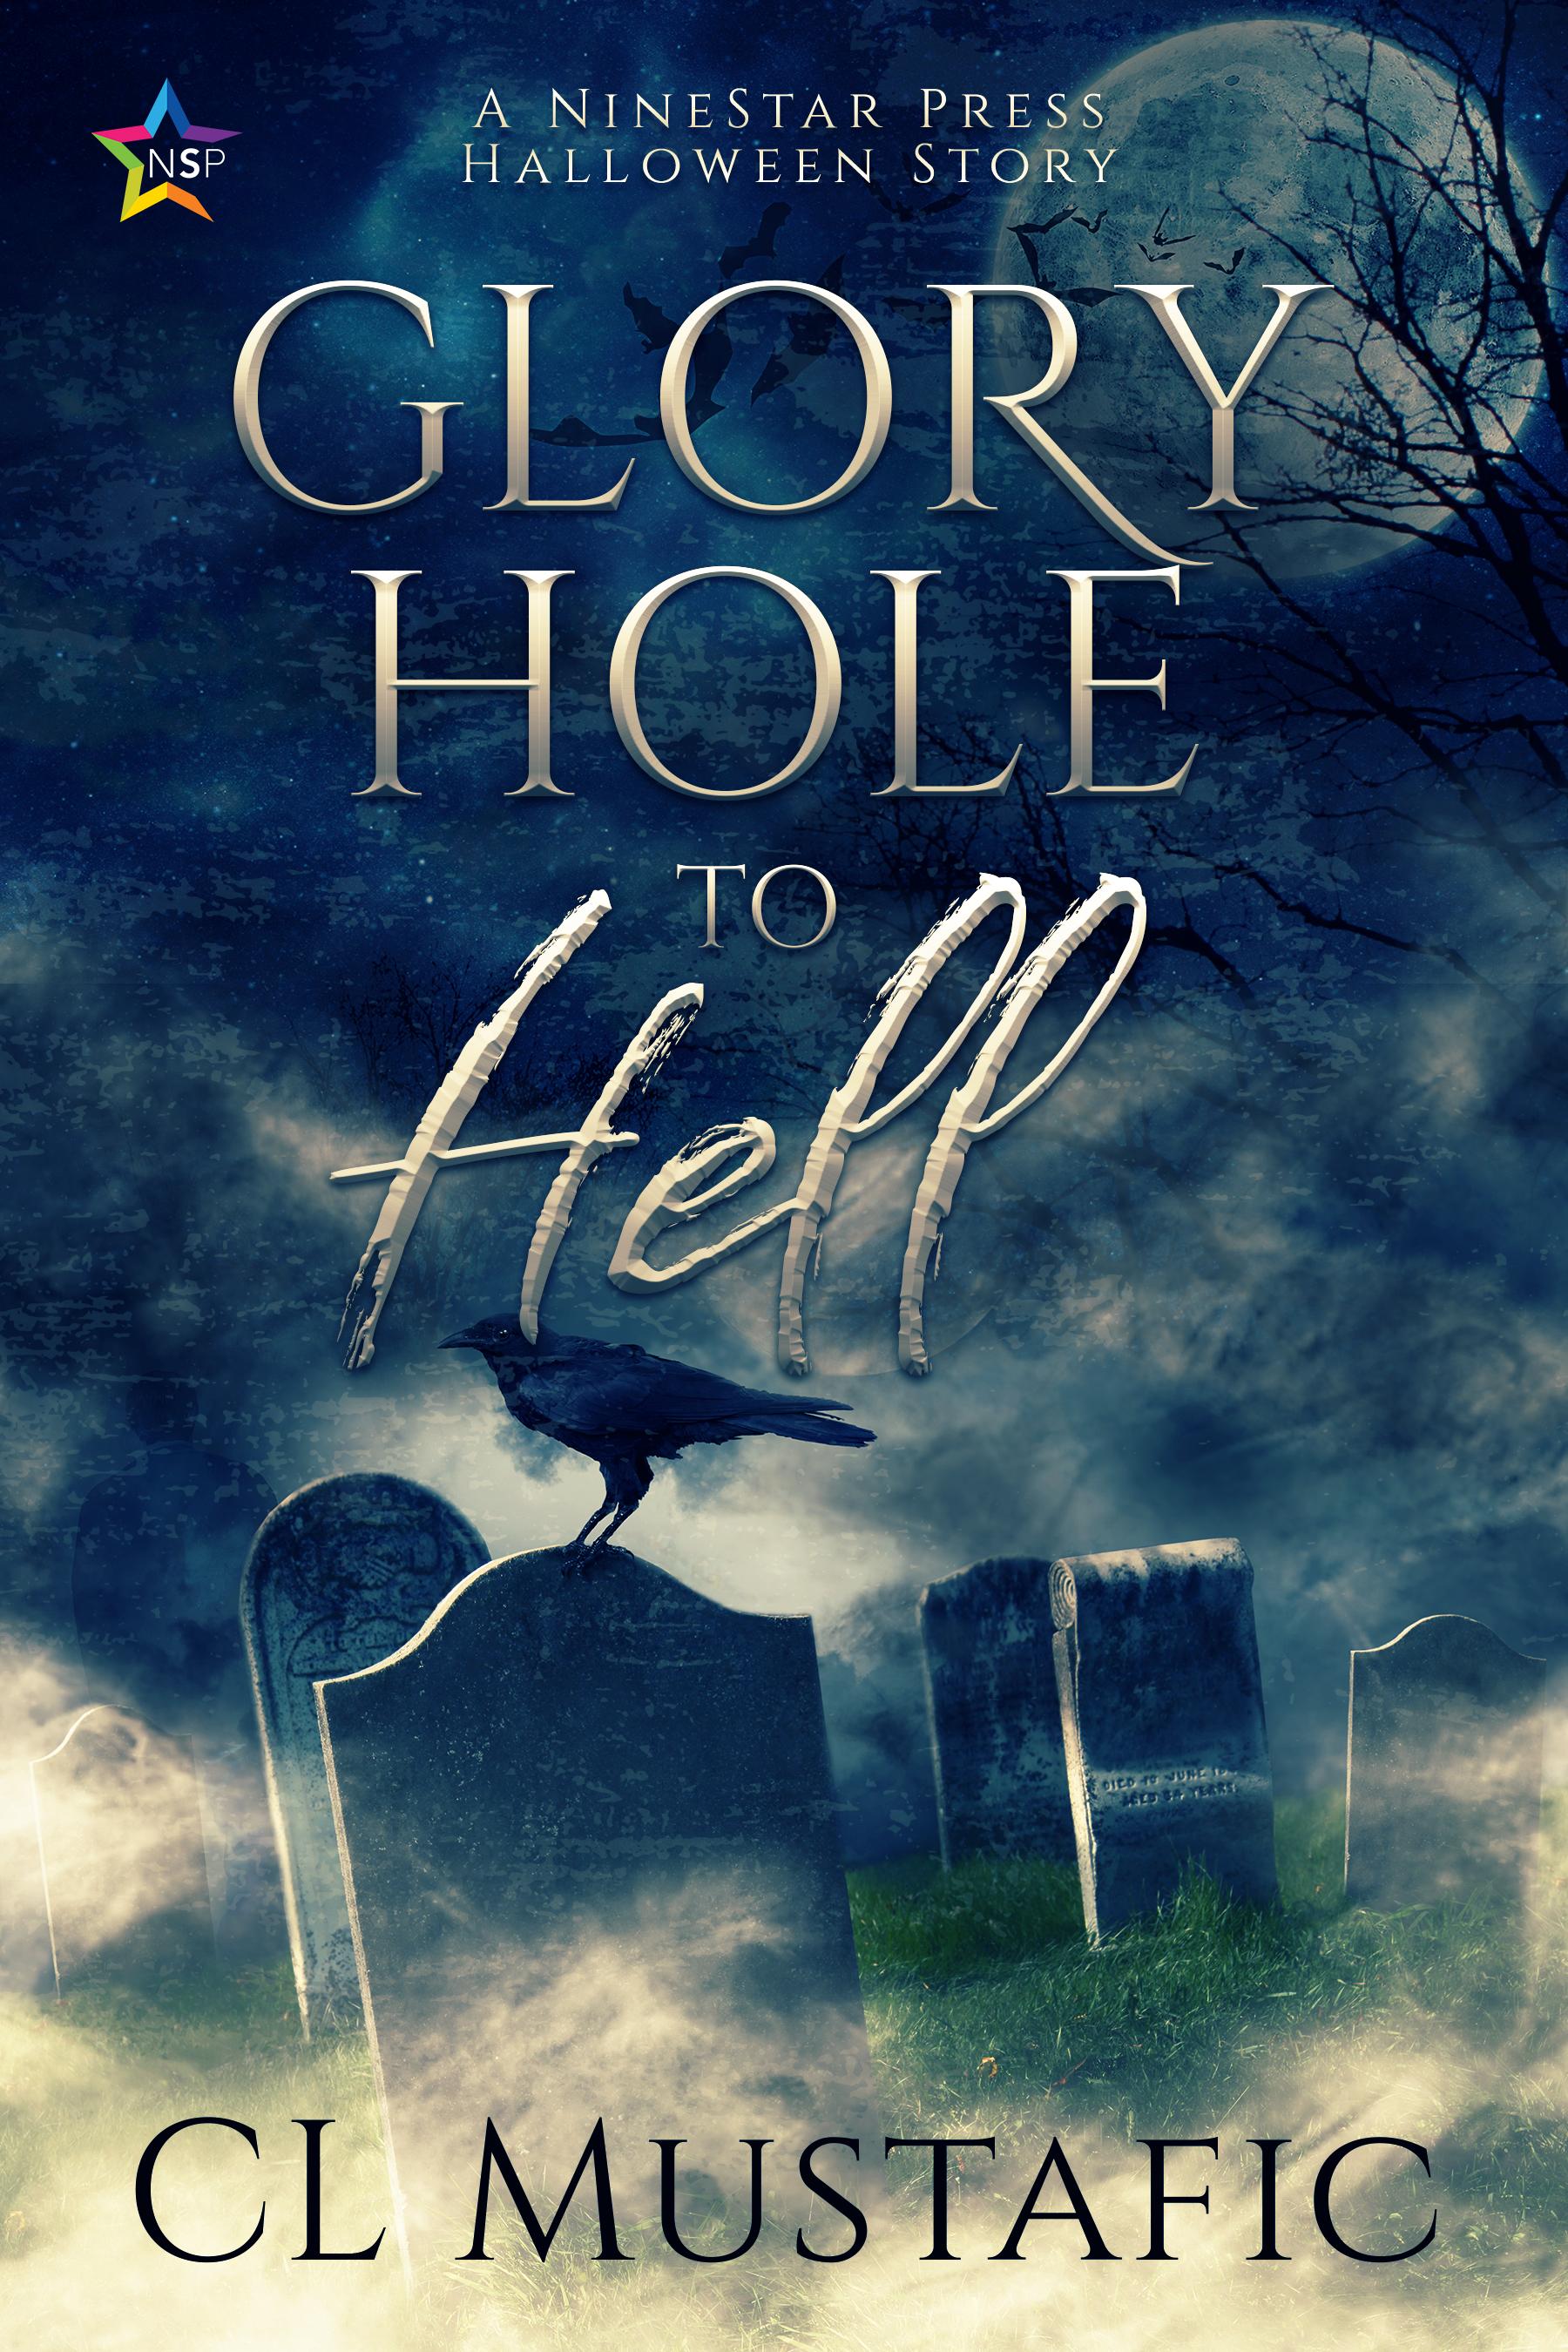 Were not Glory hole story